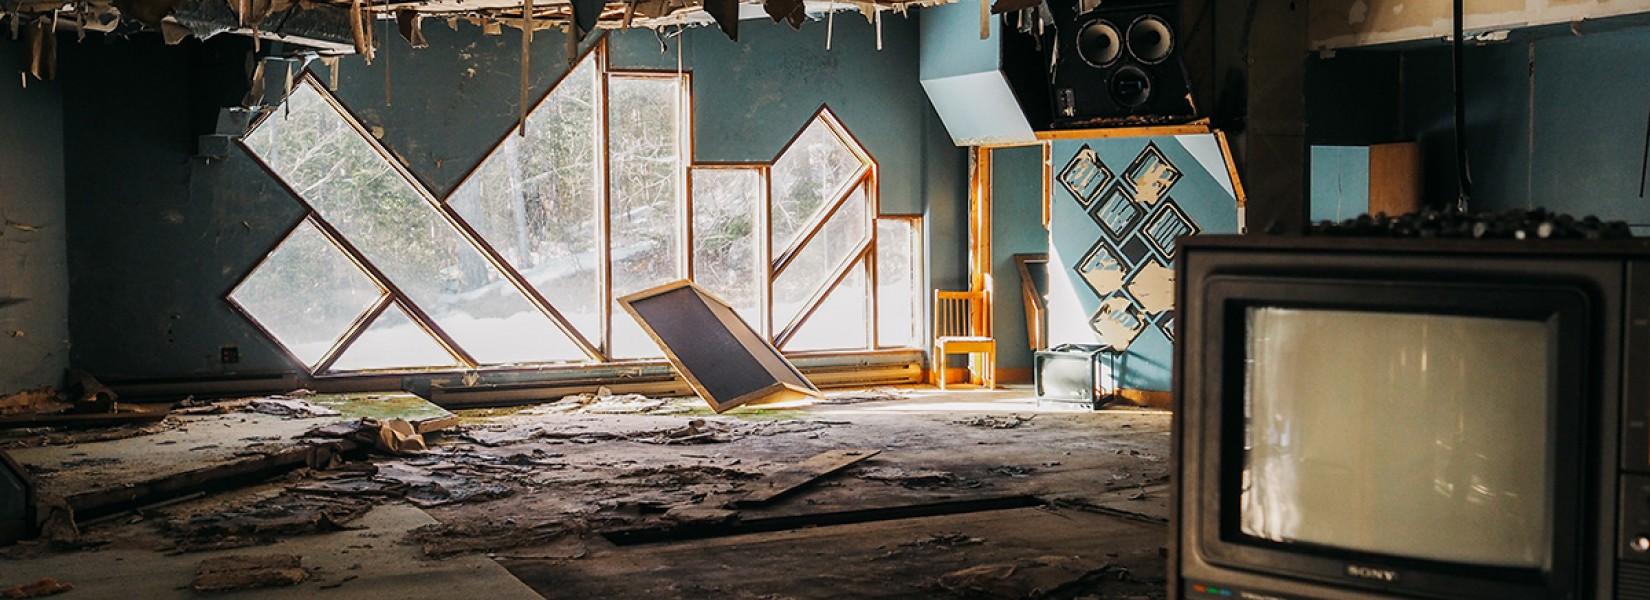 The abandoned music studio